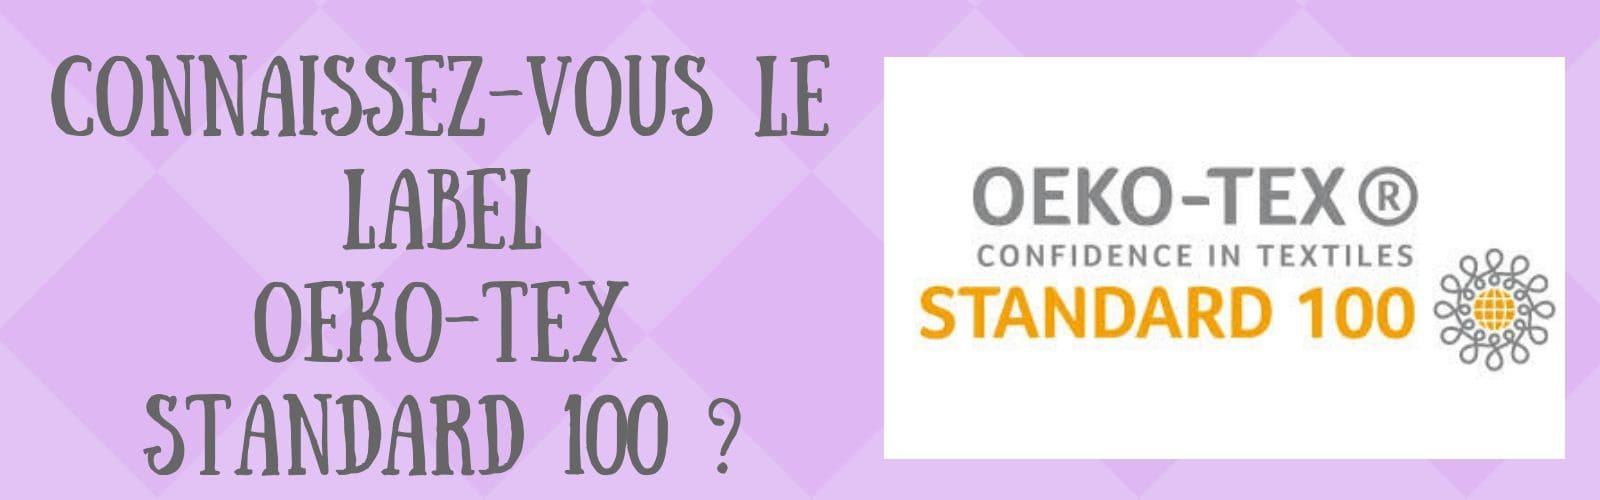 Oeko-tex-satndard-100